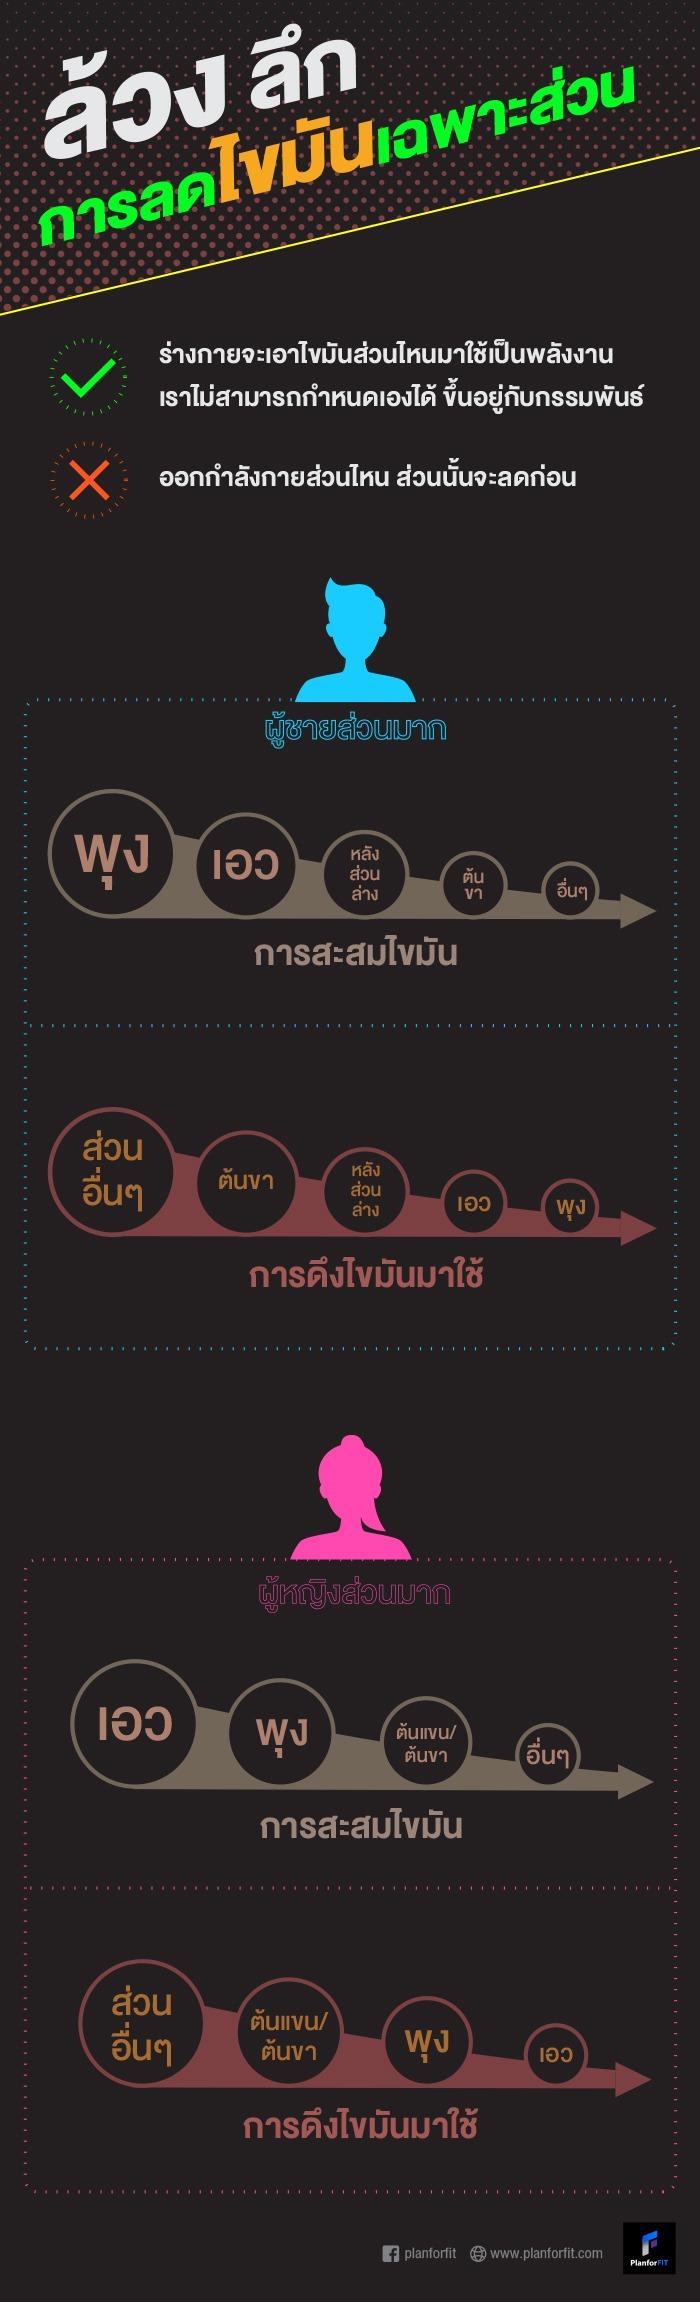 40_secret_p